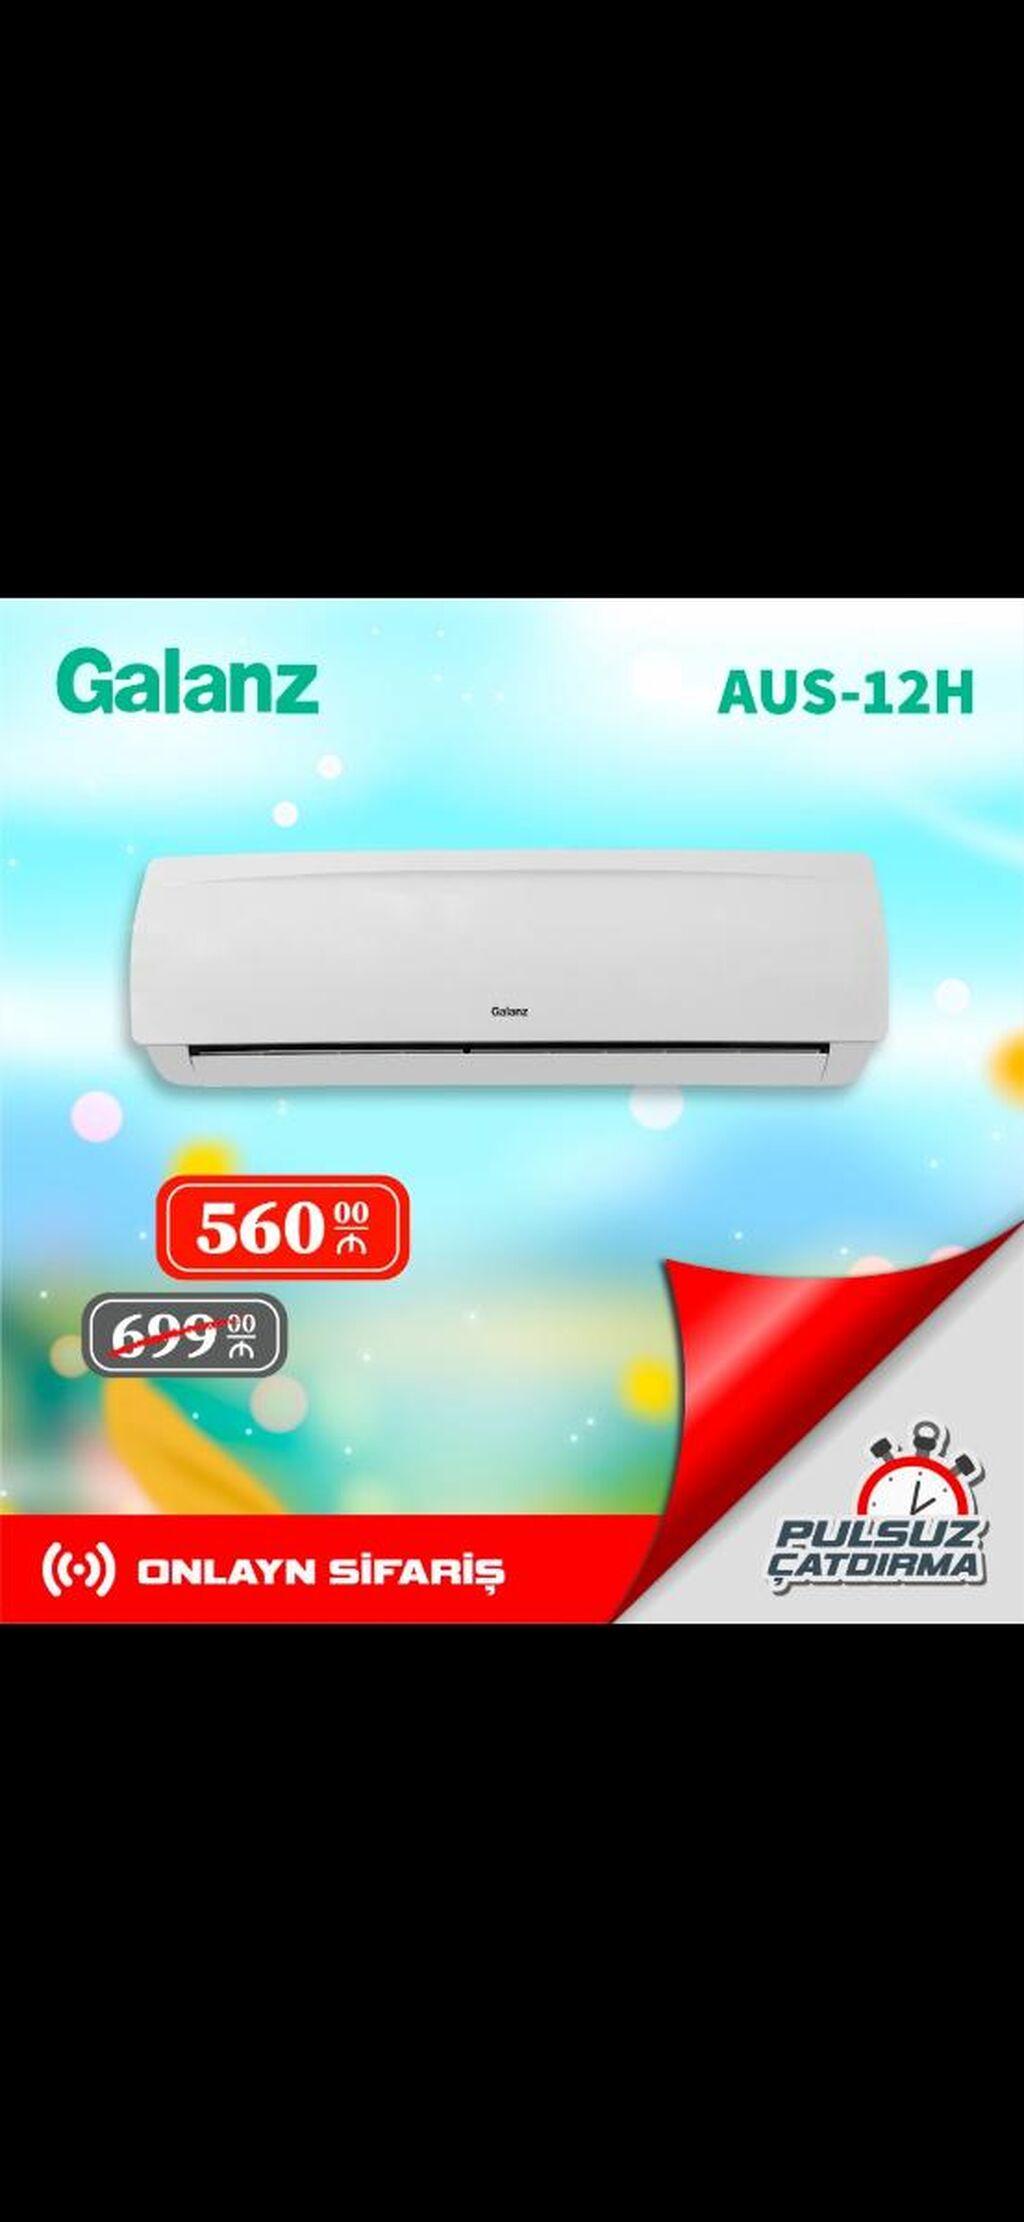 Galanz AUS-12H